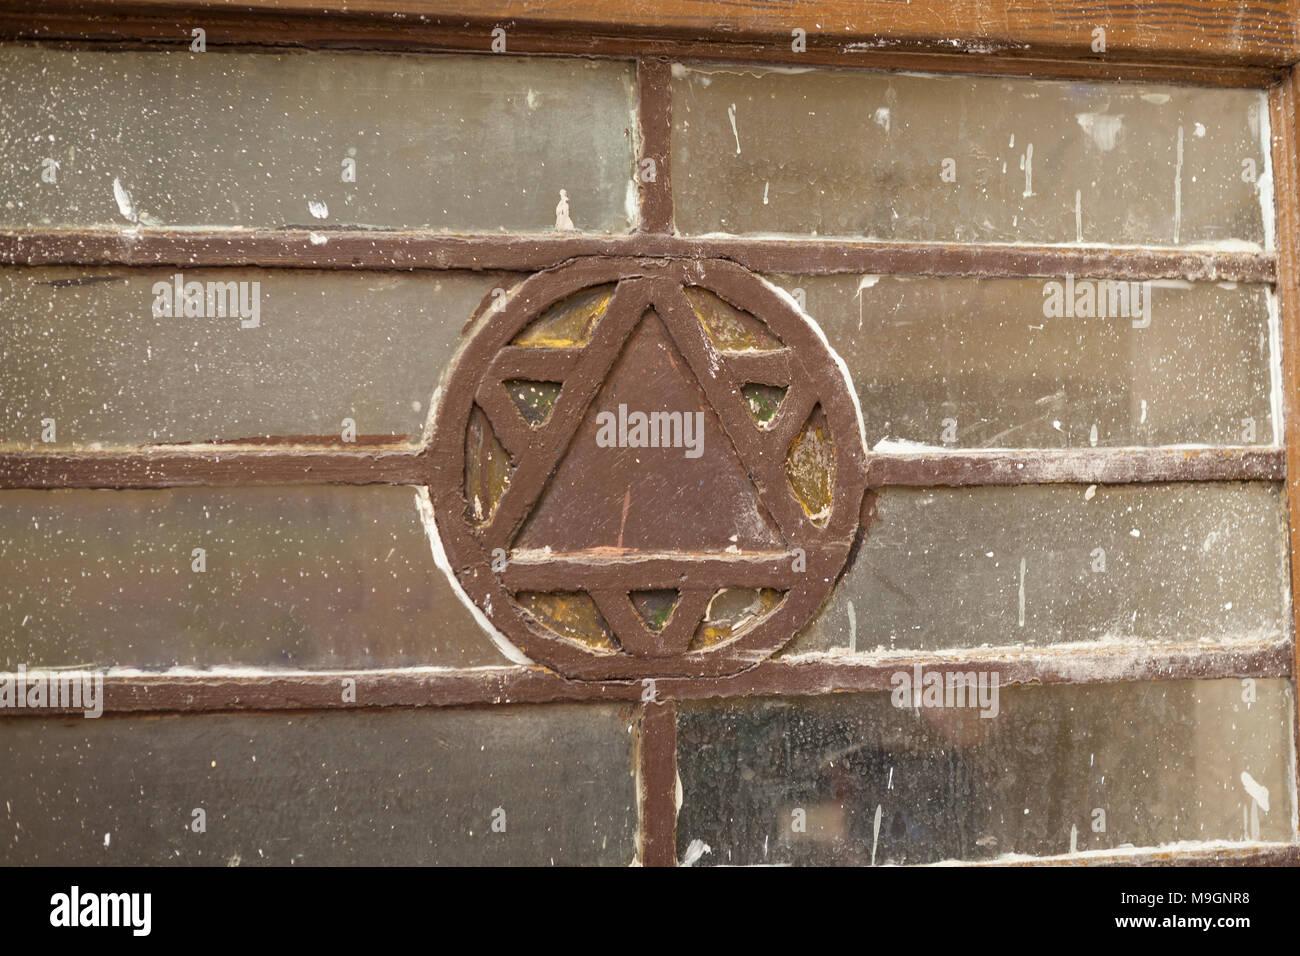 Jewish star on old vintage door in Budapest downtown - Stock Image & Jewish Star Door Stock Photos \u0026 Jewish Star Door Stock Images - Alamy